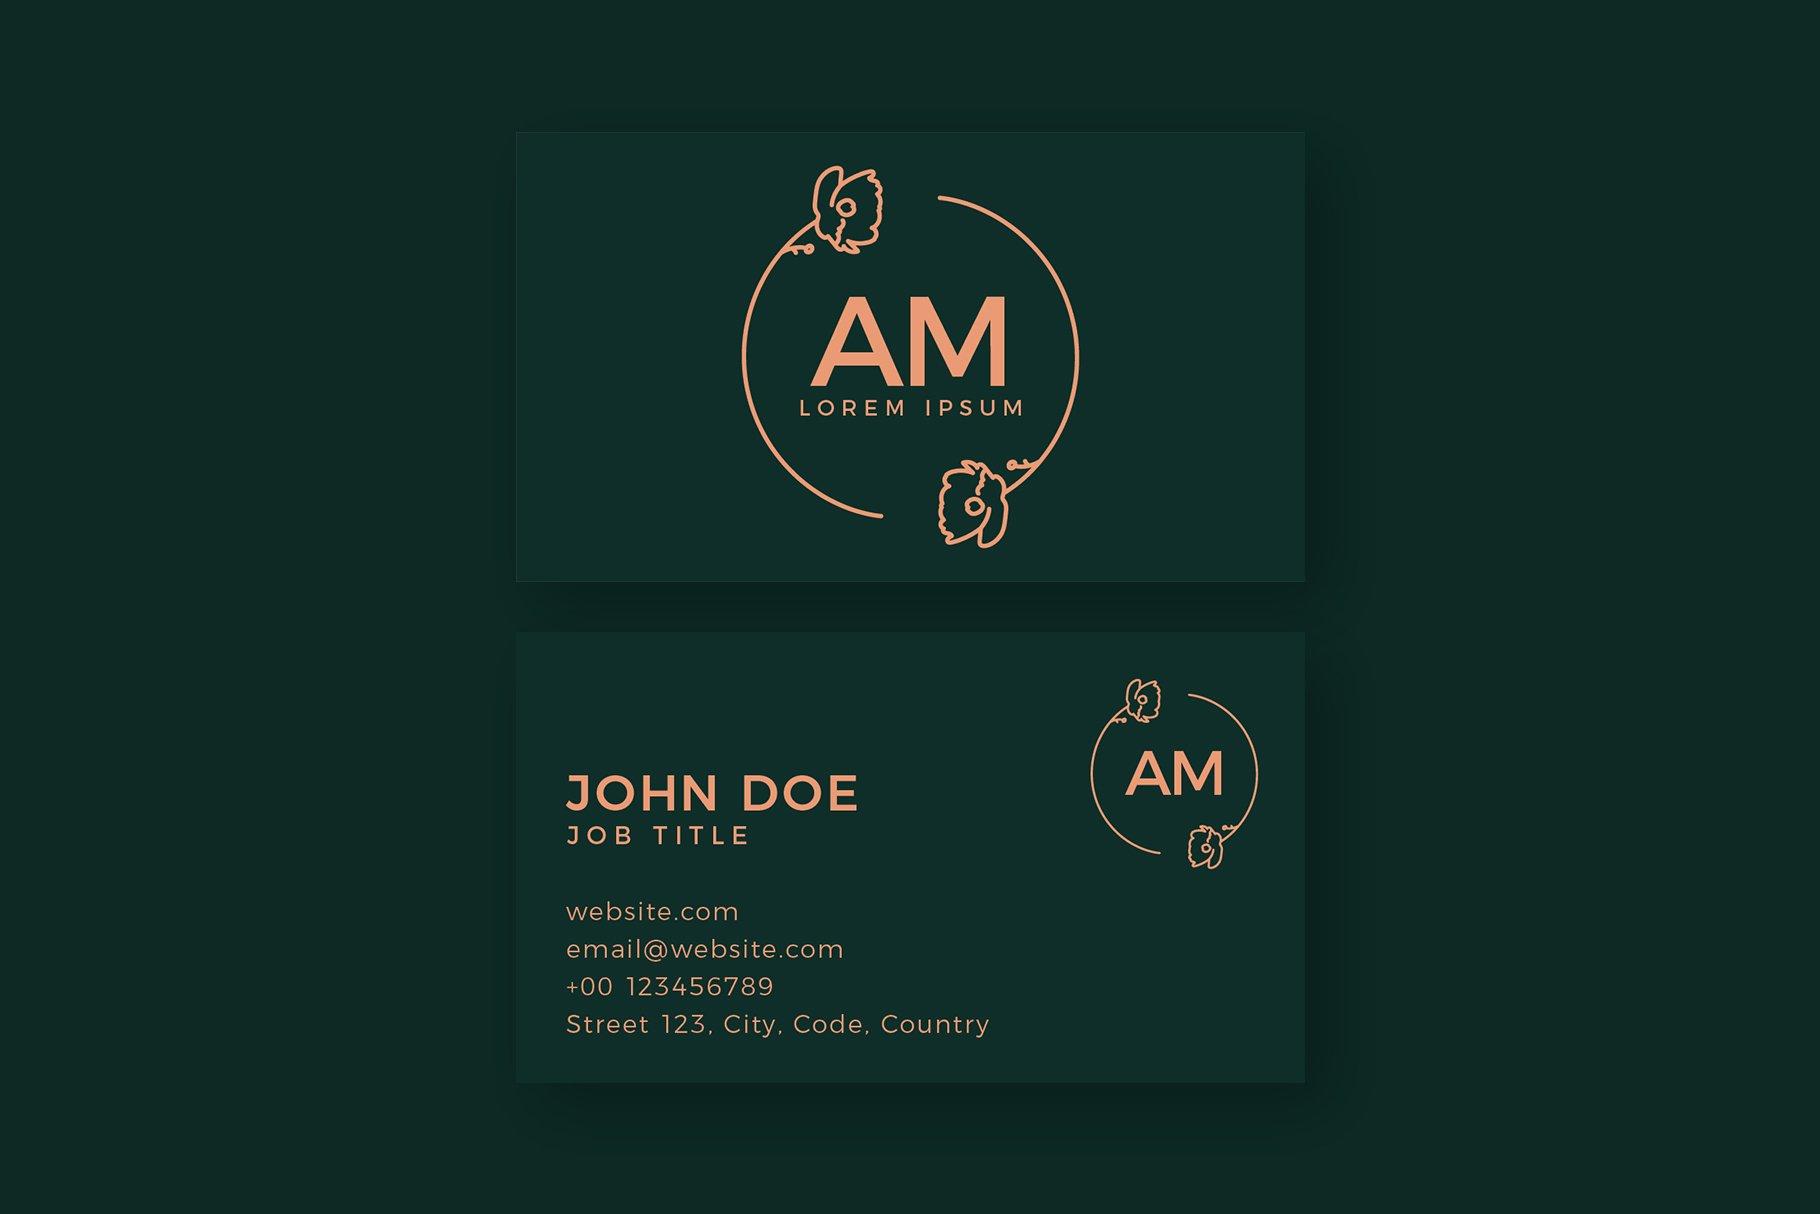 Monogram Logo & Business Card Templates example image 3